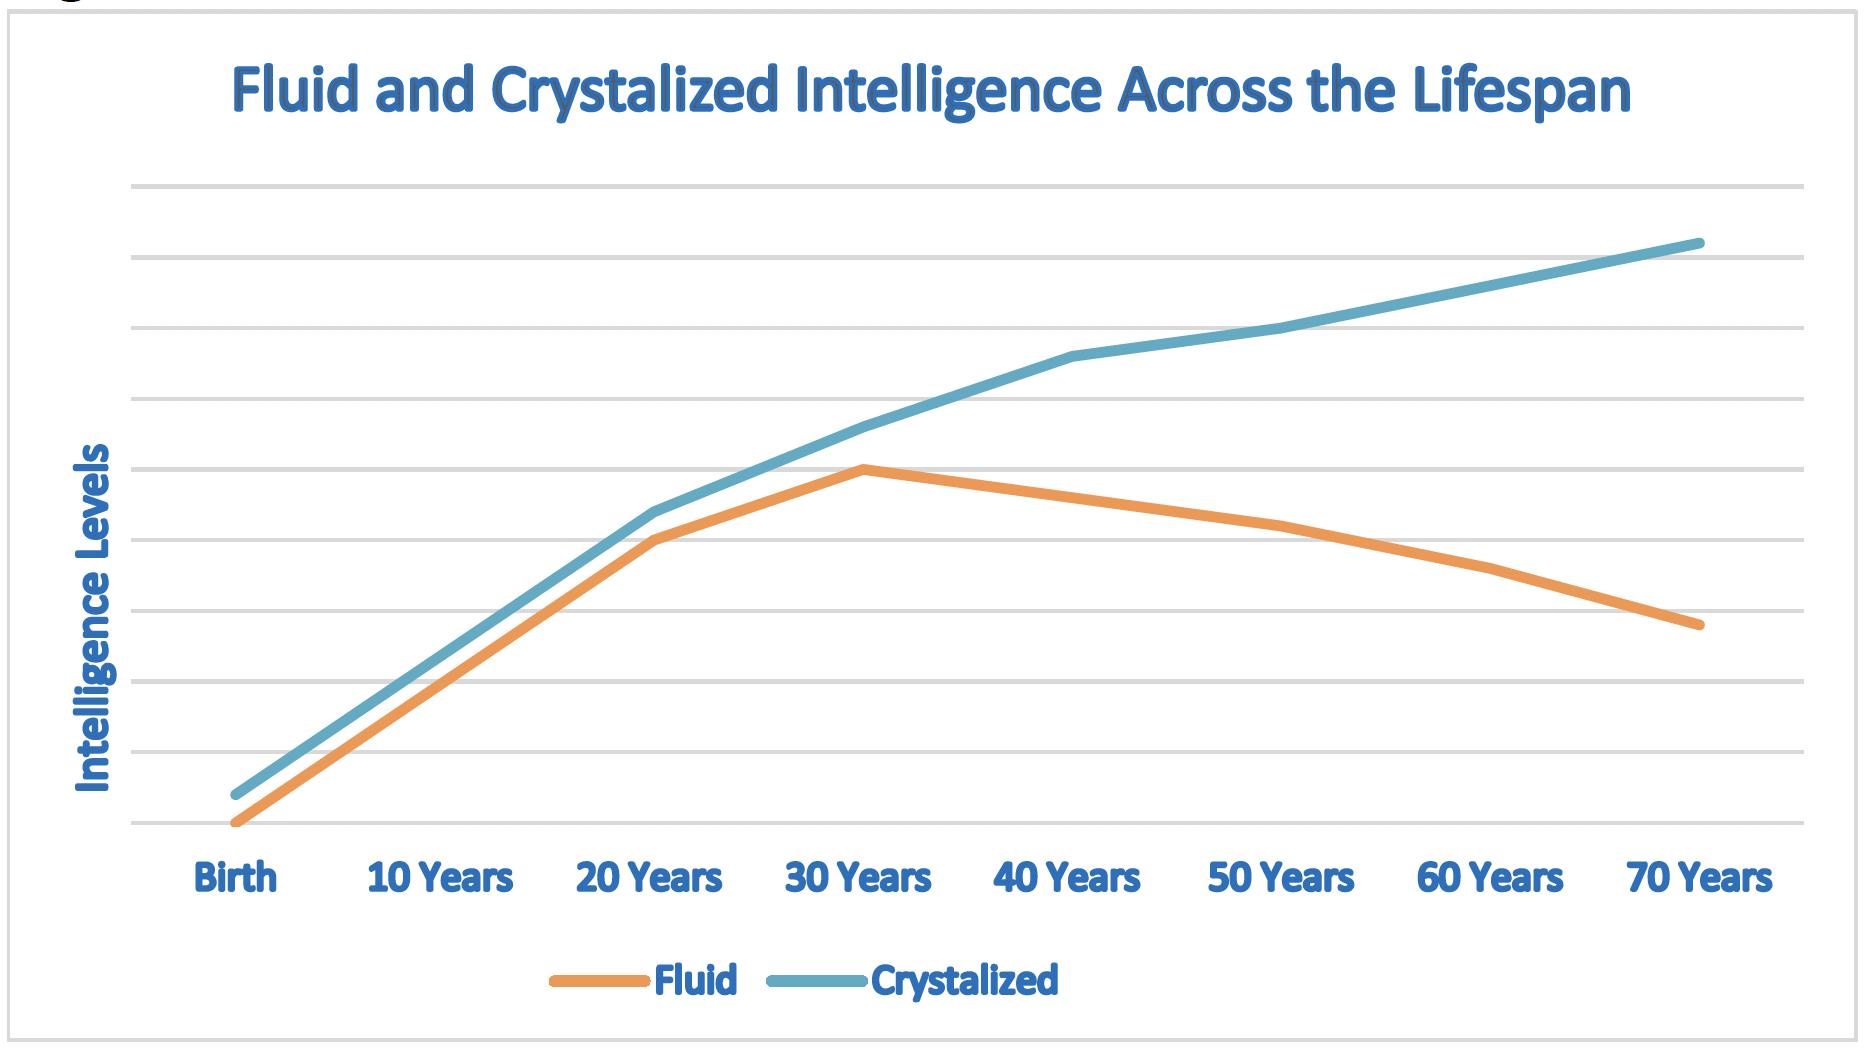 Fluid and Crystallized Intelligence